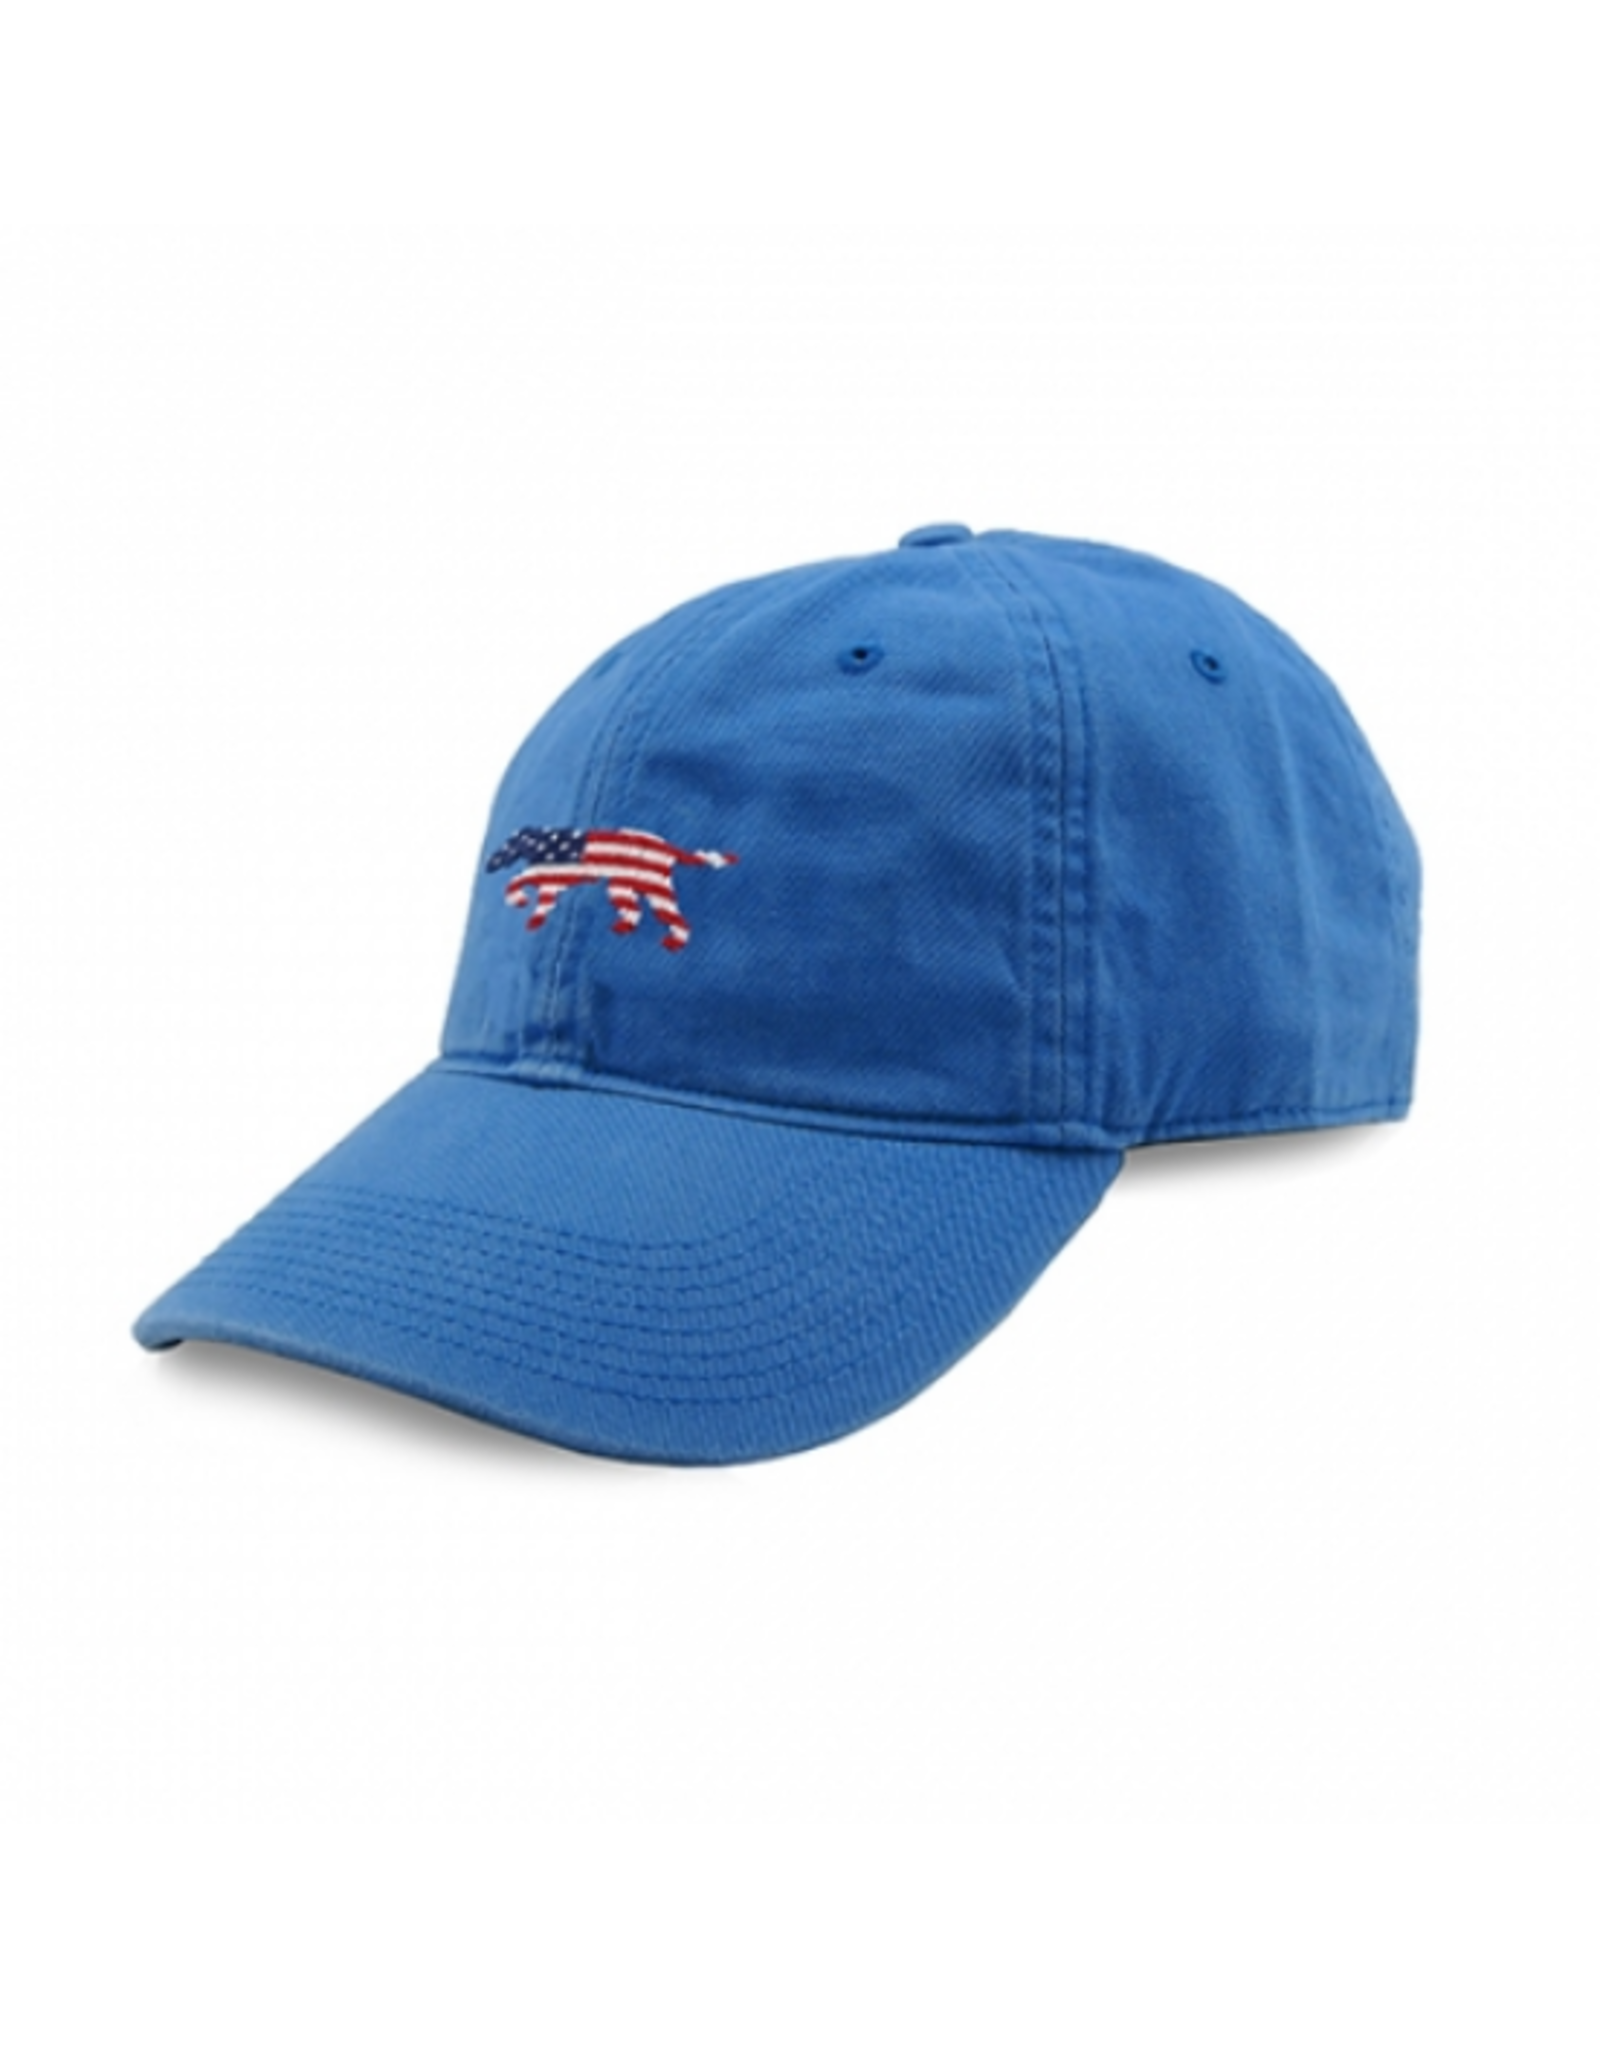 Smathers & Branson S&B Needlepoint Ball Hat, Patriotic Dog on Point